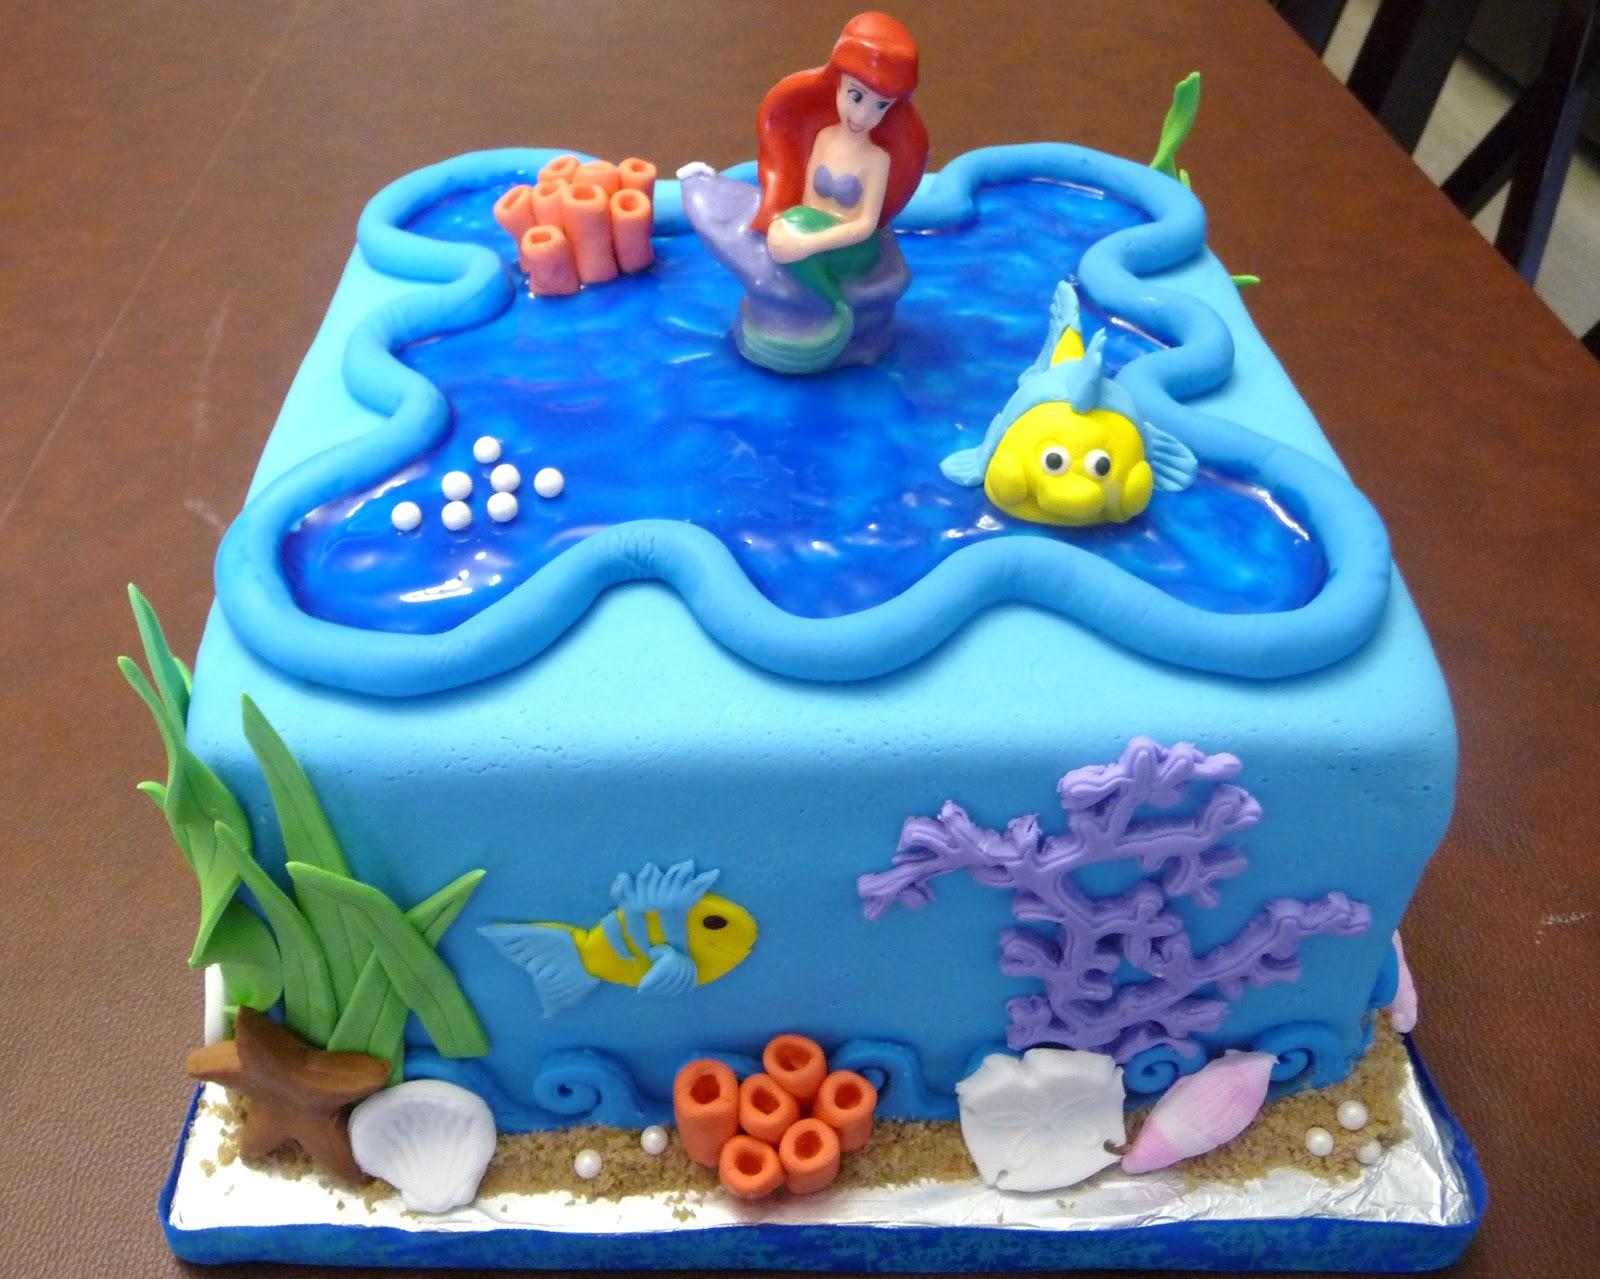 Ariel Cake Decorations 15 Best Images About Ariel Party On Pinterest Little Mermaid